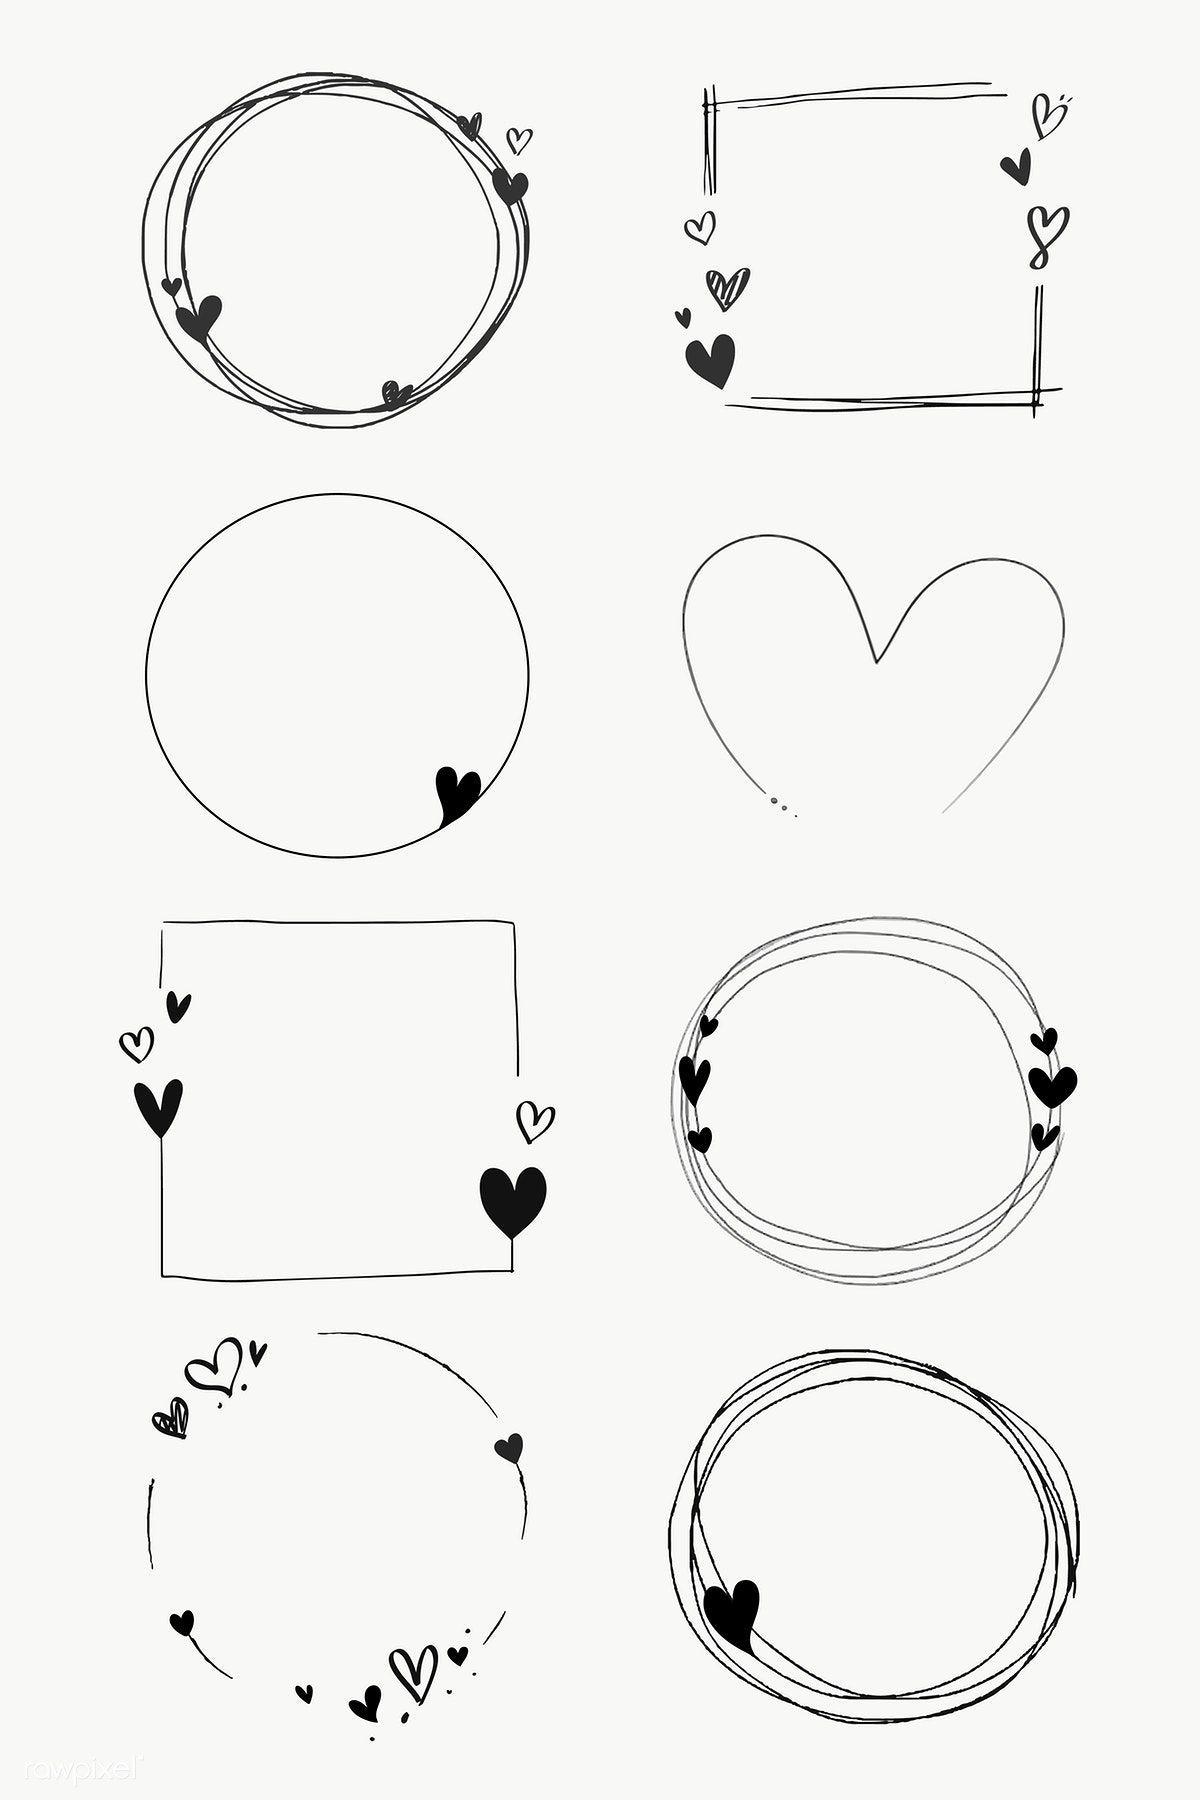 Download Premium Png Of Doodle Love Frame Collection Transparent Png Bullet Journal Ideas Pages Bullet Journal Books Bullet Journal Art